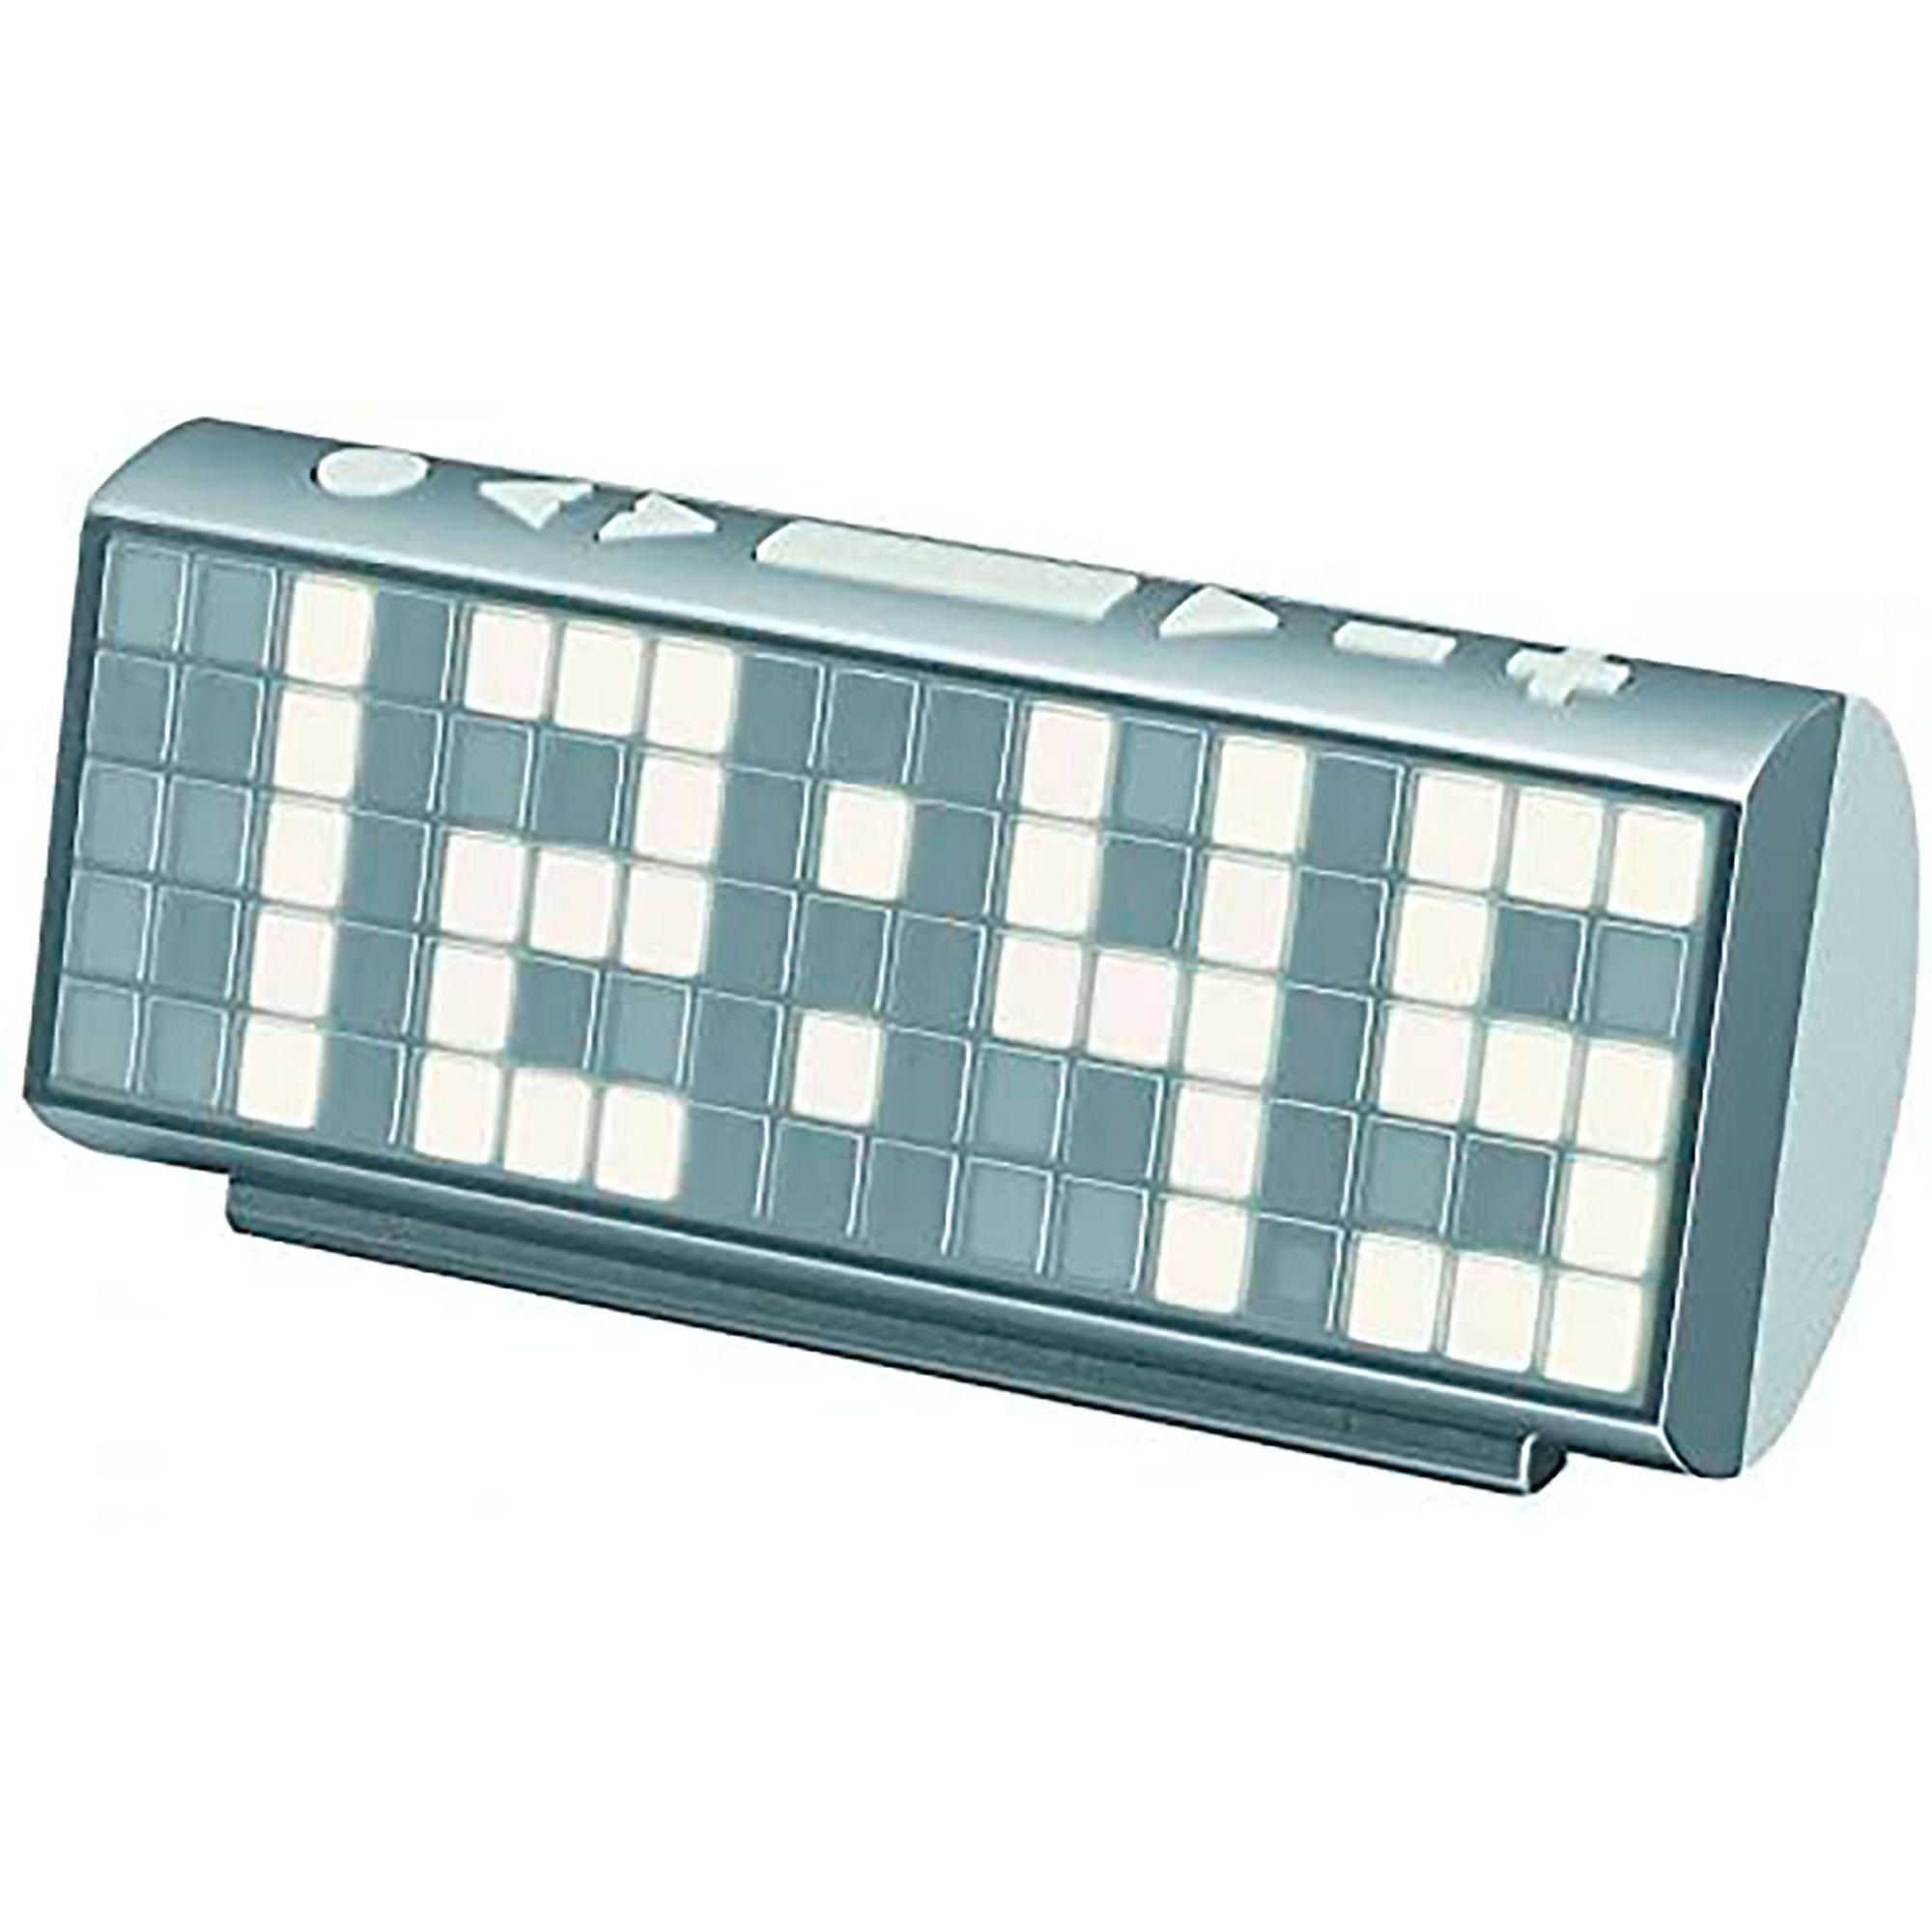 Soundmaster UR200WE Radio Despertador Jumbo, Portátil FM PLL, Sintonizador Analógico, Compacta, Pantalla LCD, 2 Alarmas Programables, Blanco